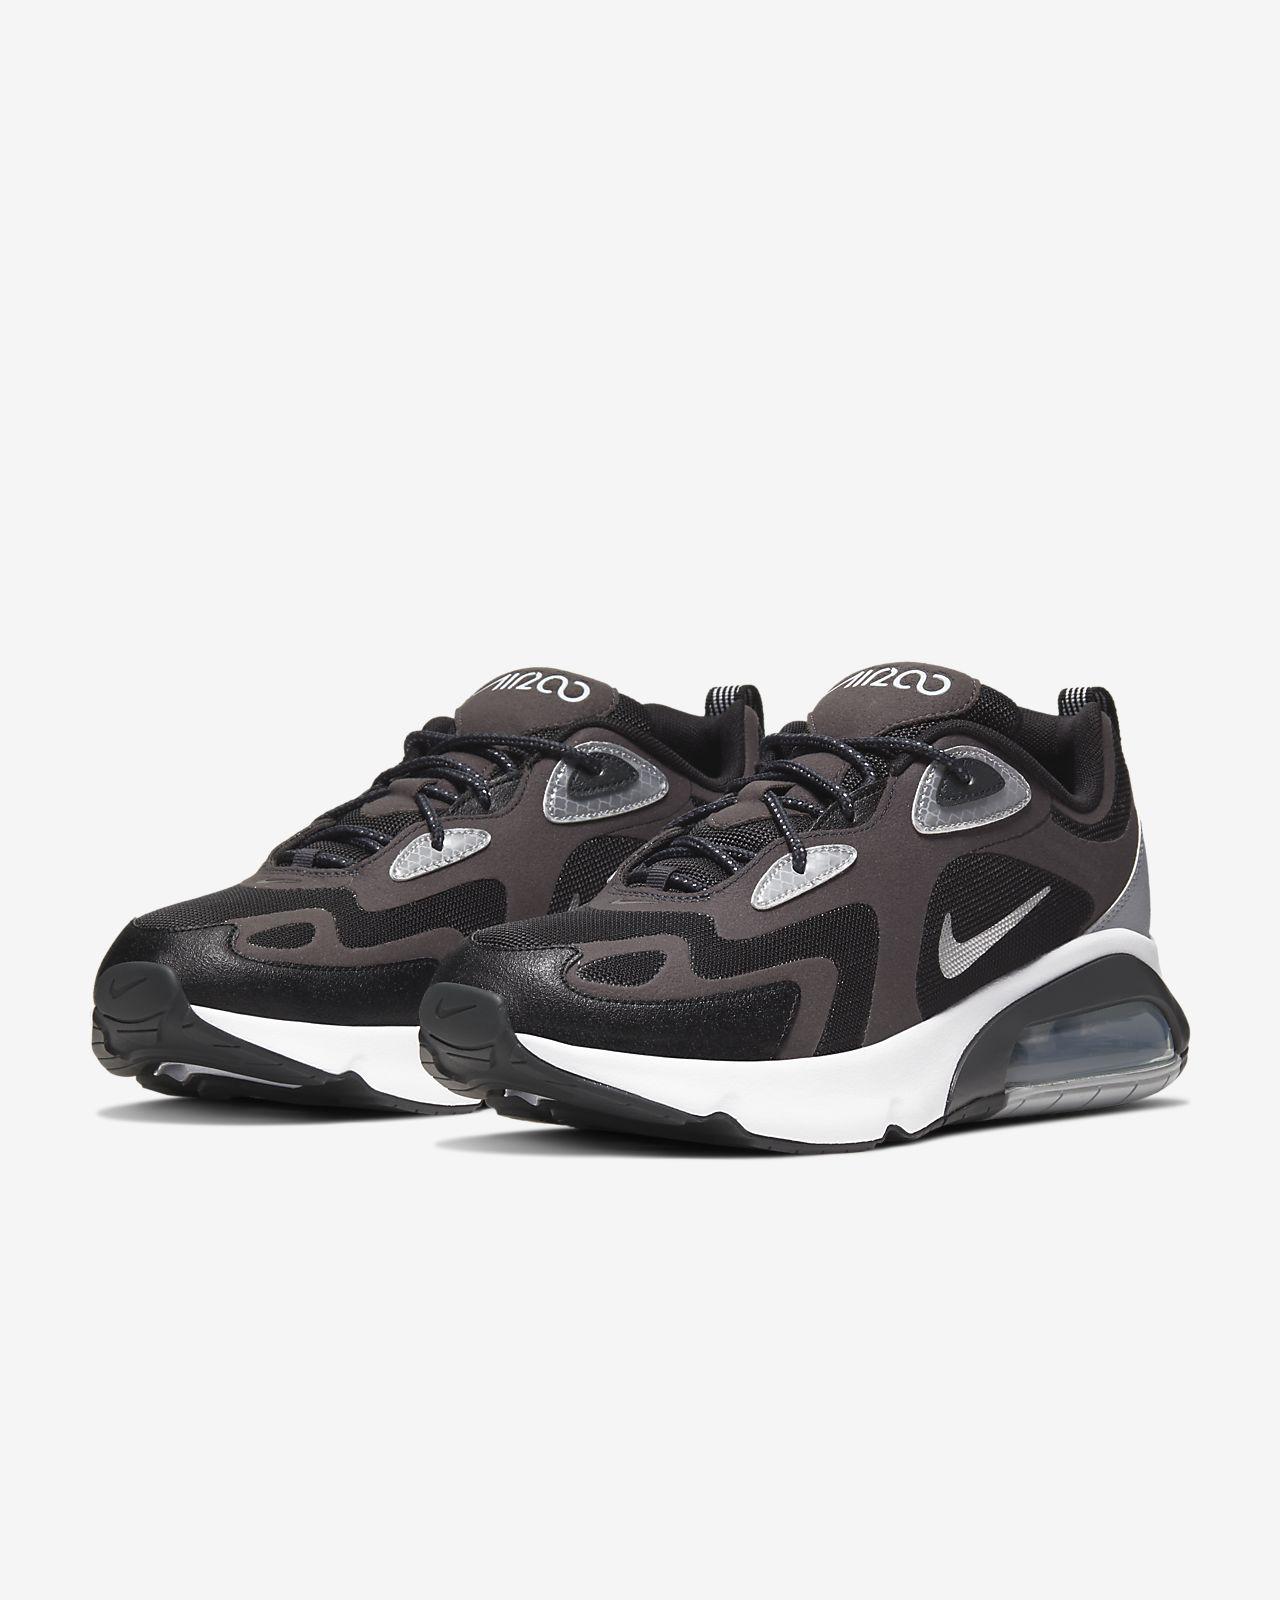 Calzado para hombre Nike Air Max 200 Winter